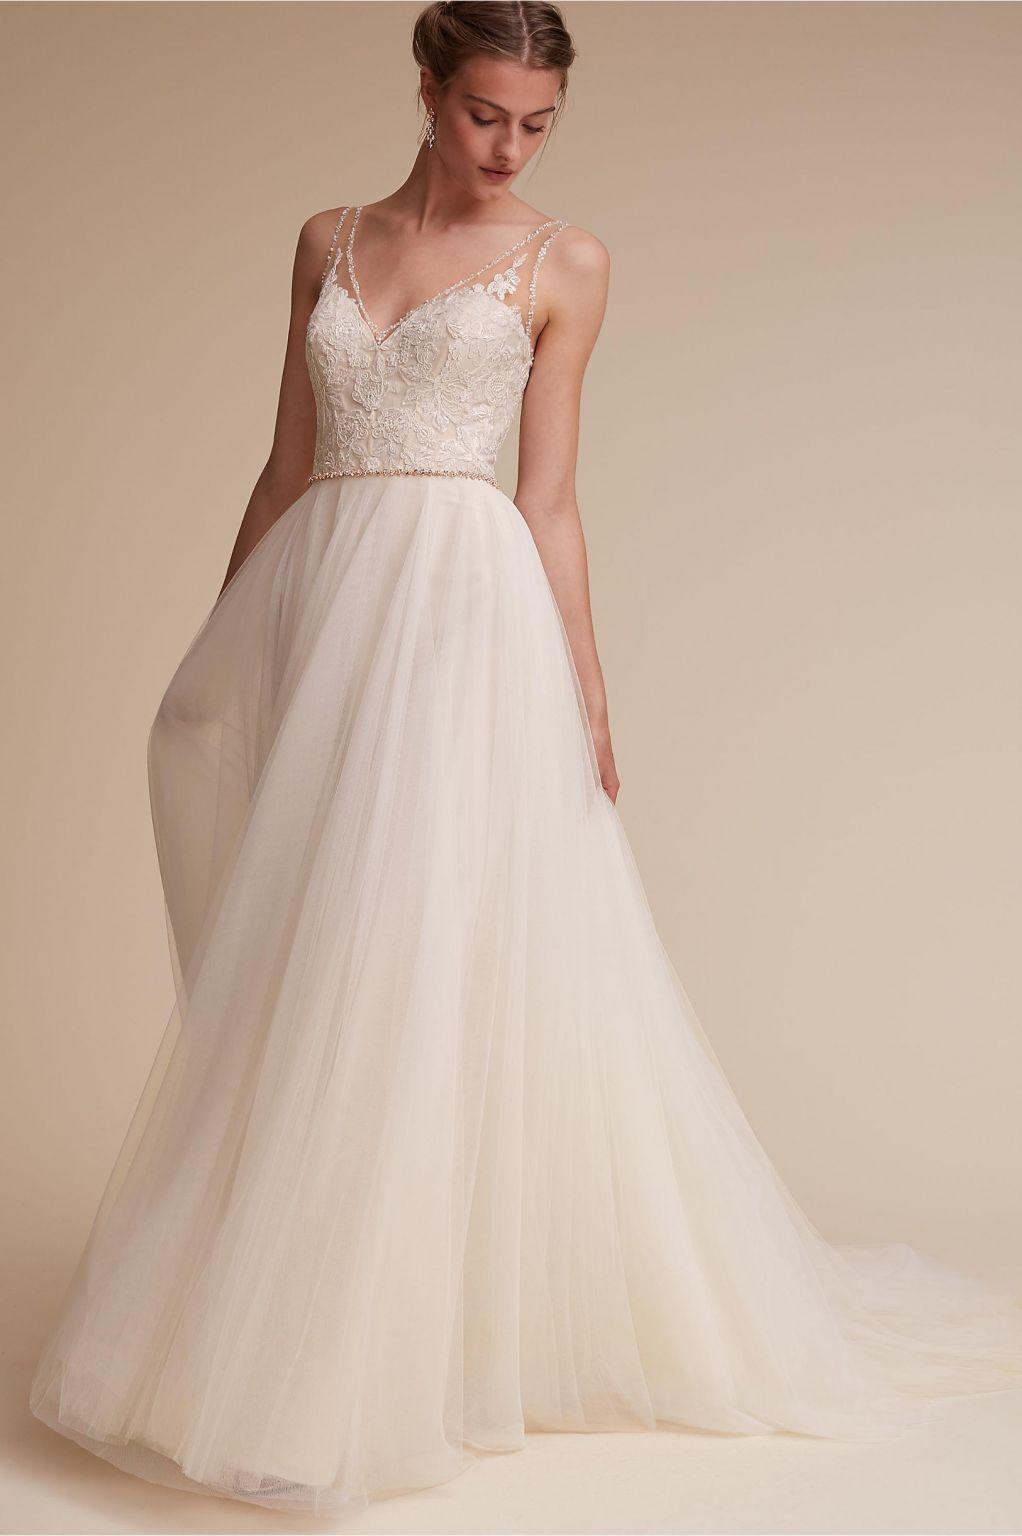 BHLDN cassia gown Wedding Dress   Used, Size: 2, $700